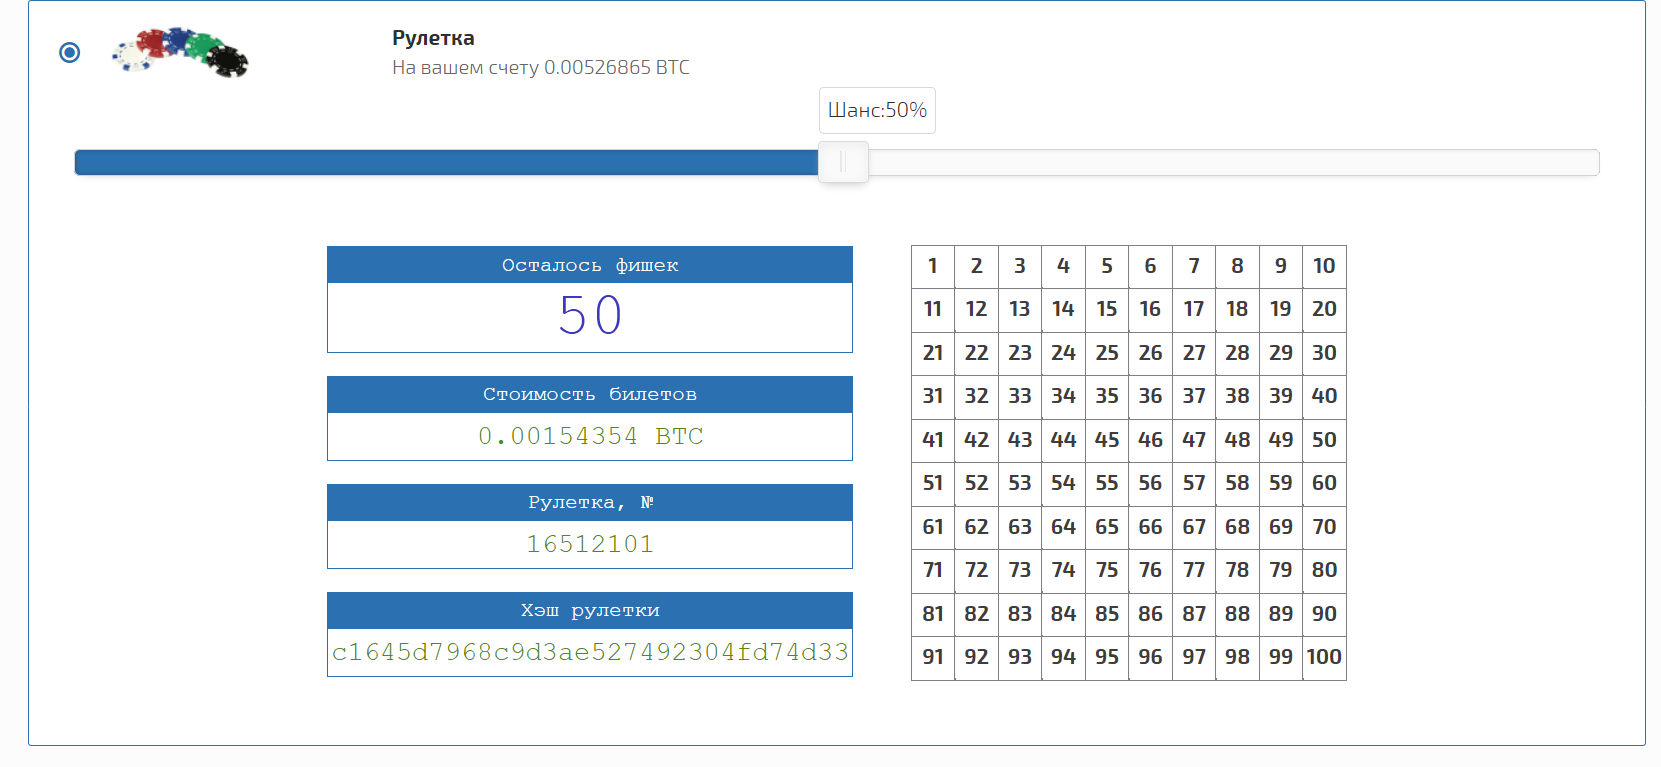 9a79617c3a14377458f56 - Рулетка при заказе на HYDRA – правила и подробности работы.